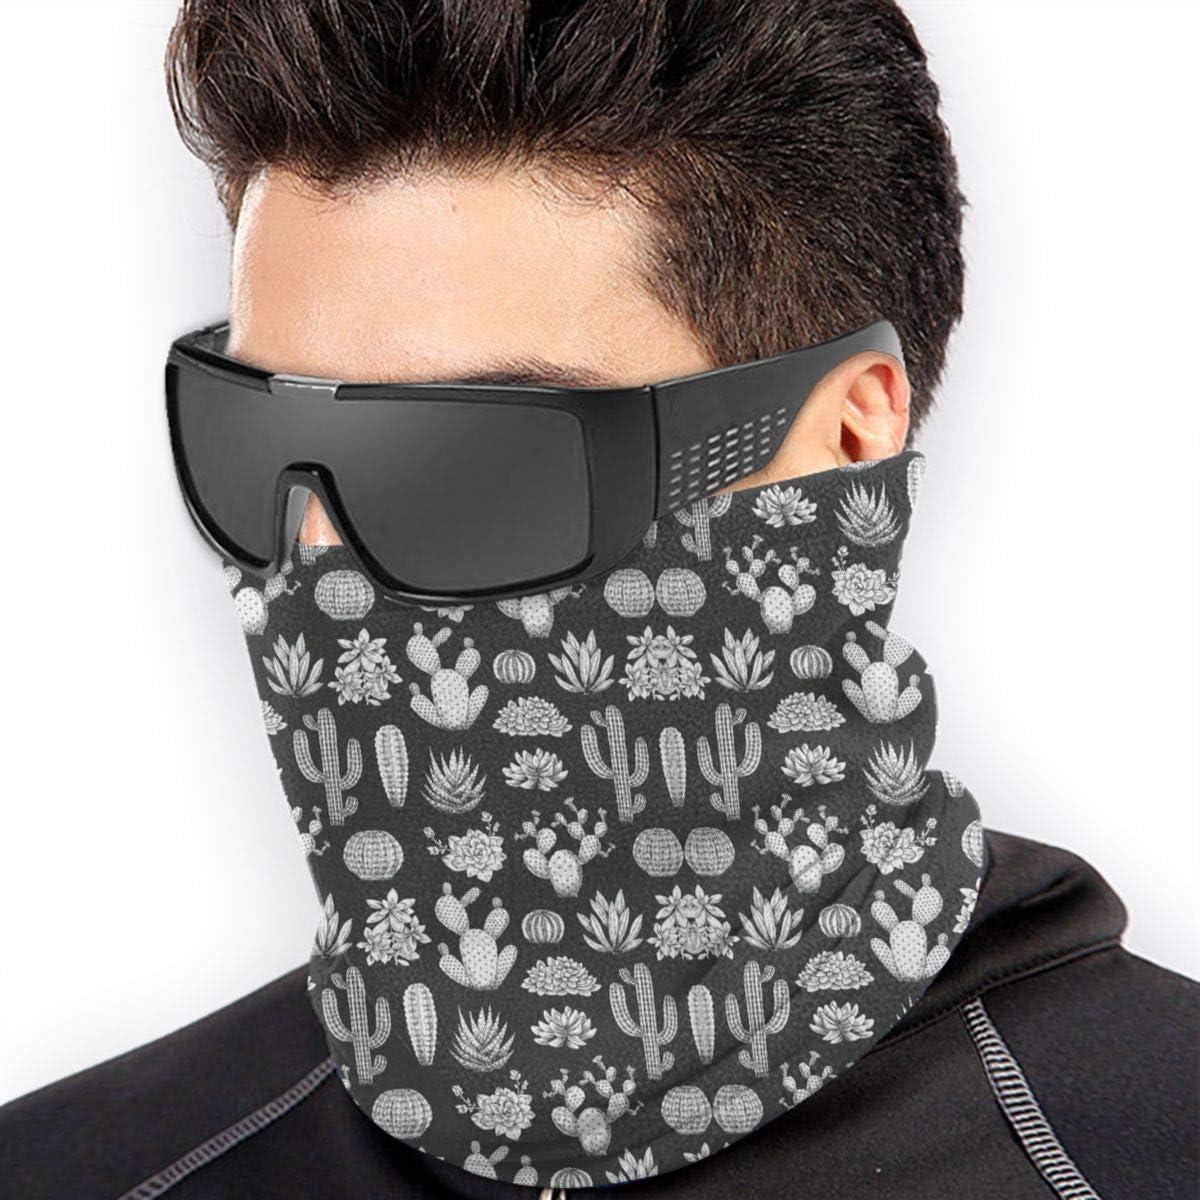 Microfiber Mask//Neck Warmer Gaiter,Cactus Printing Head Wrap,Headband